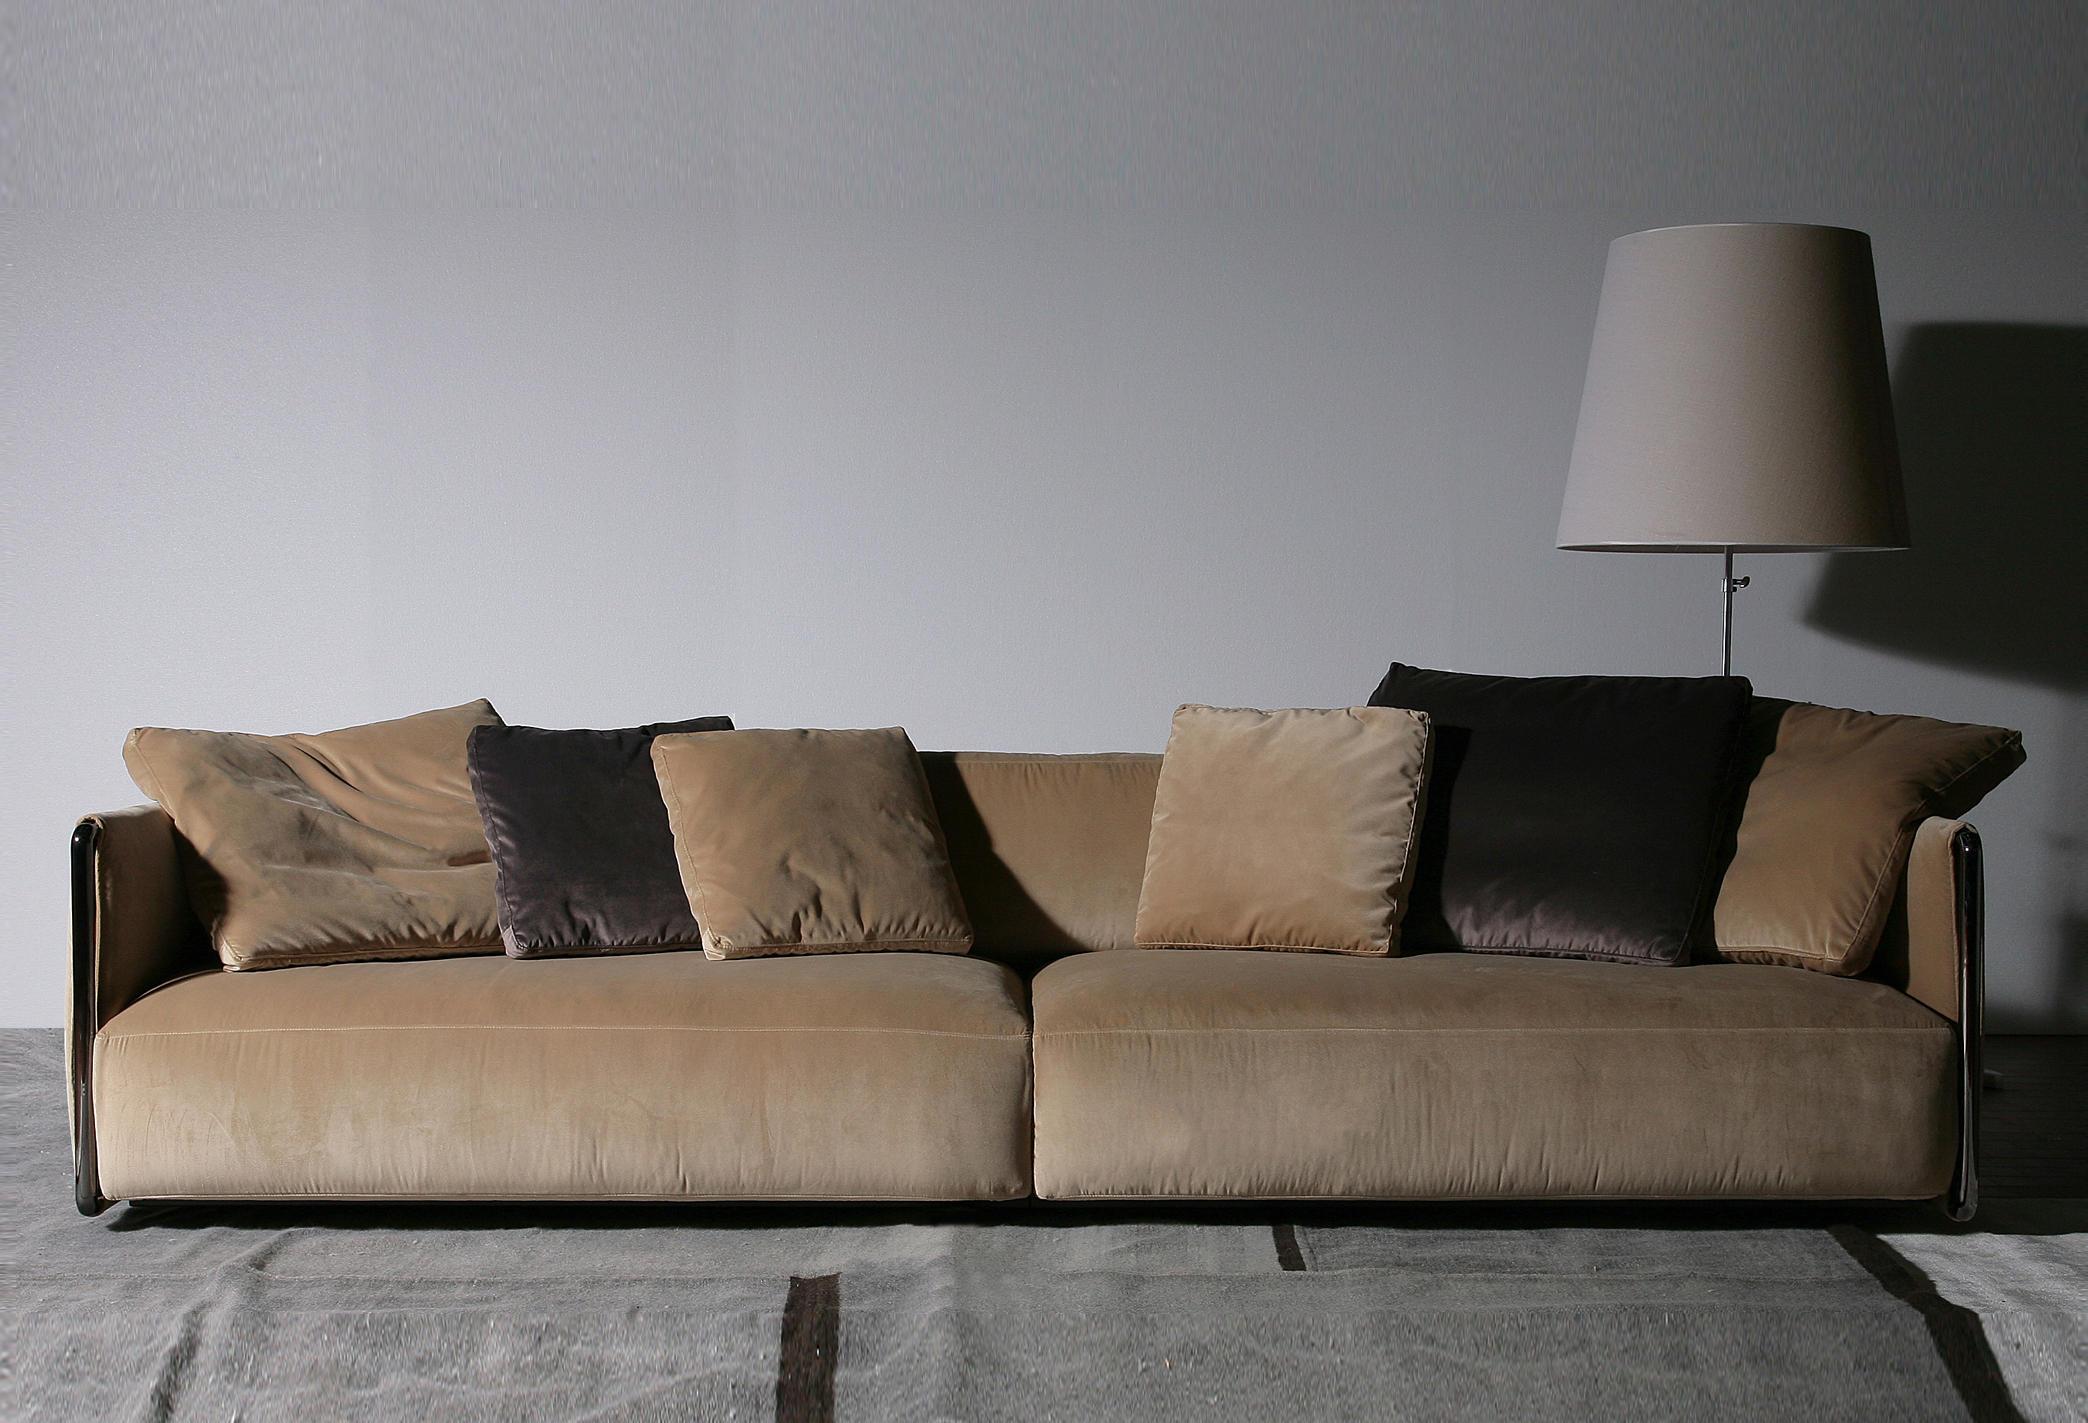 Colombo Divani A Meda edmond sofa - sofas from flexform | architonic